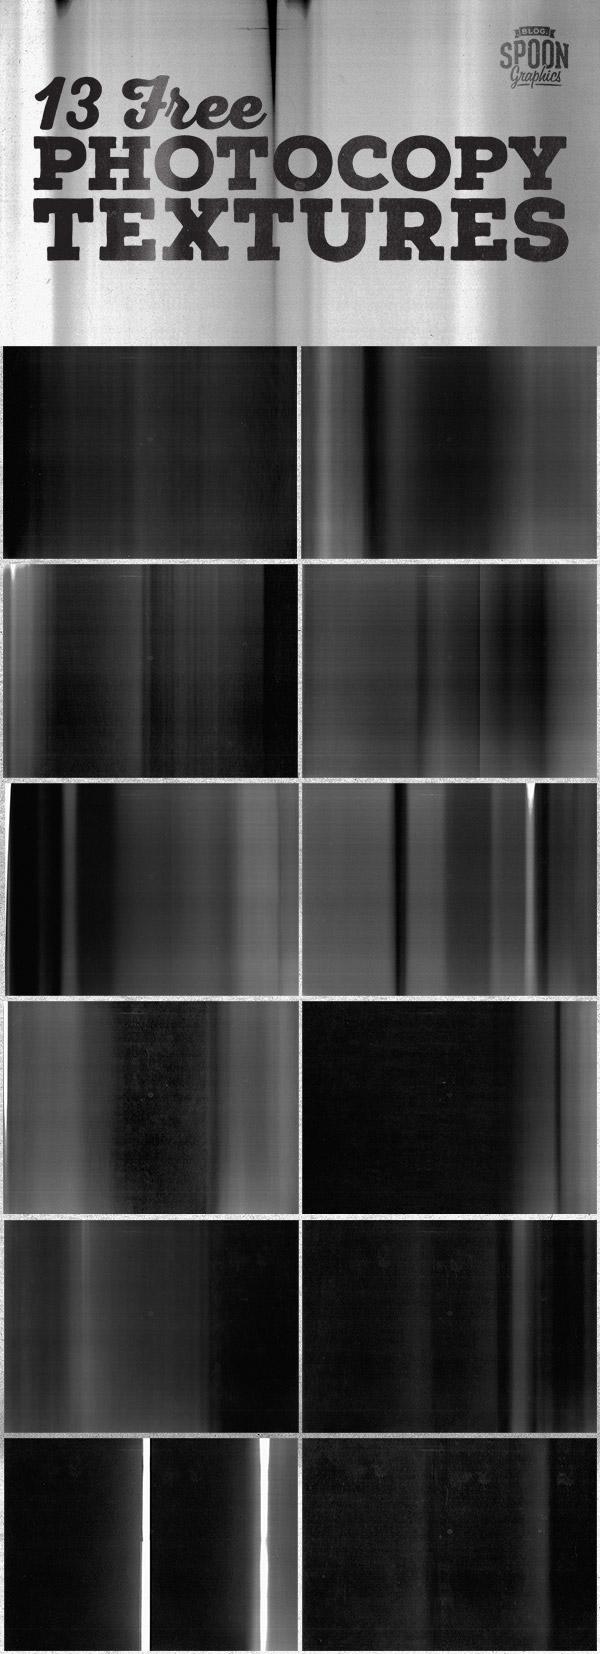 13 Free Photocopy Textures